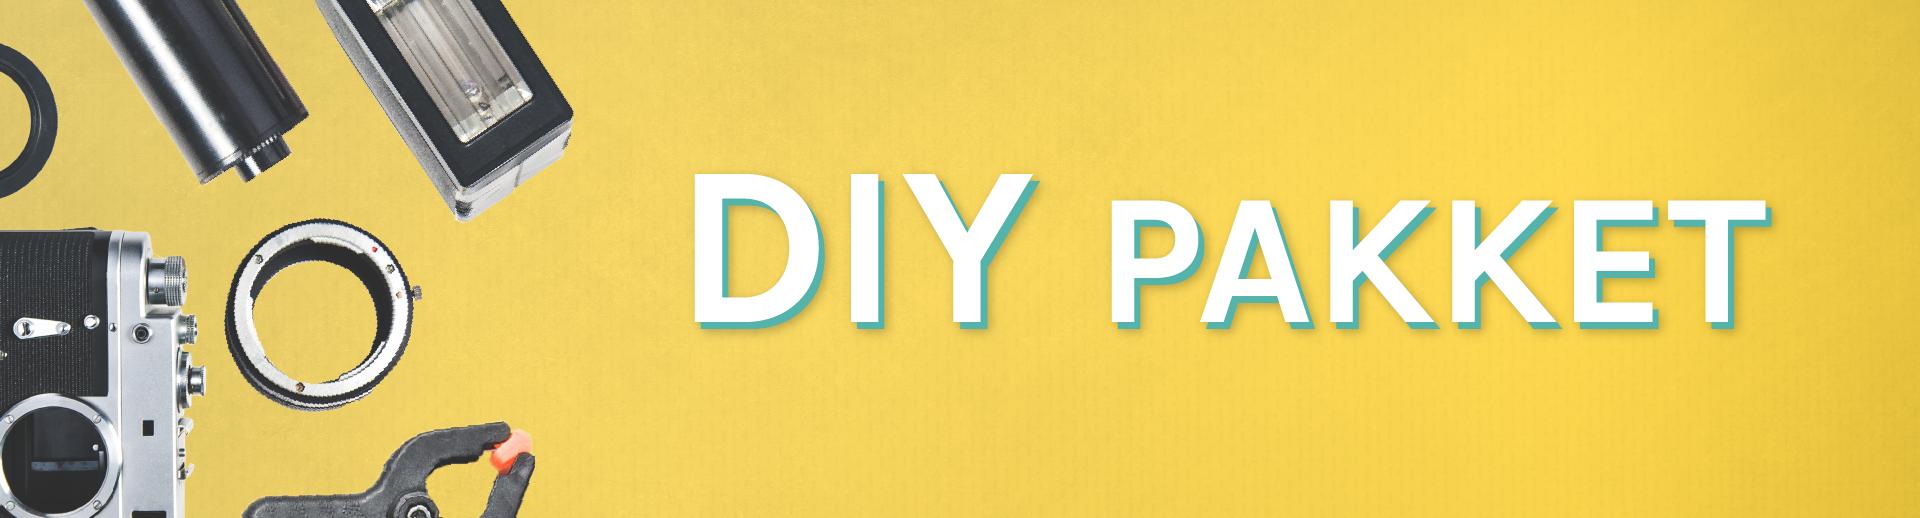 DIY_pakket